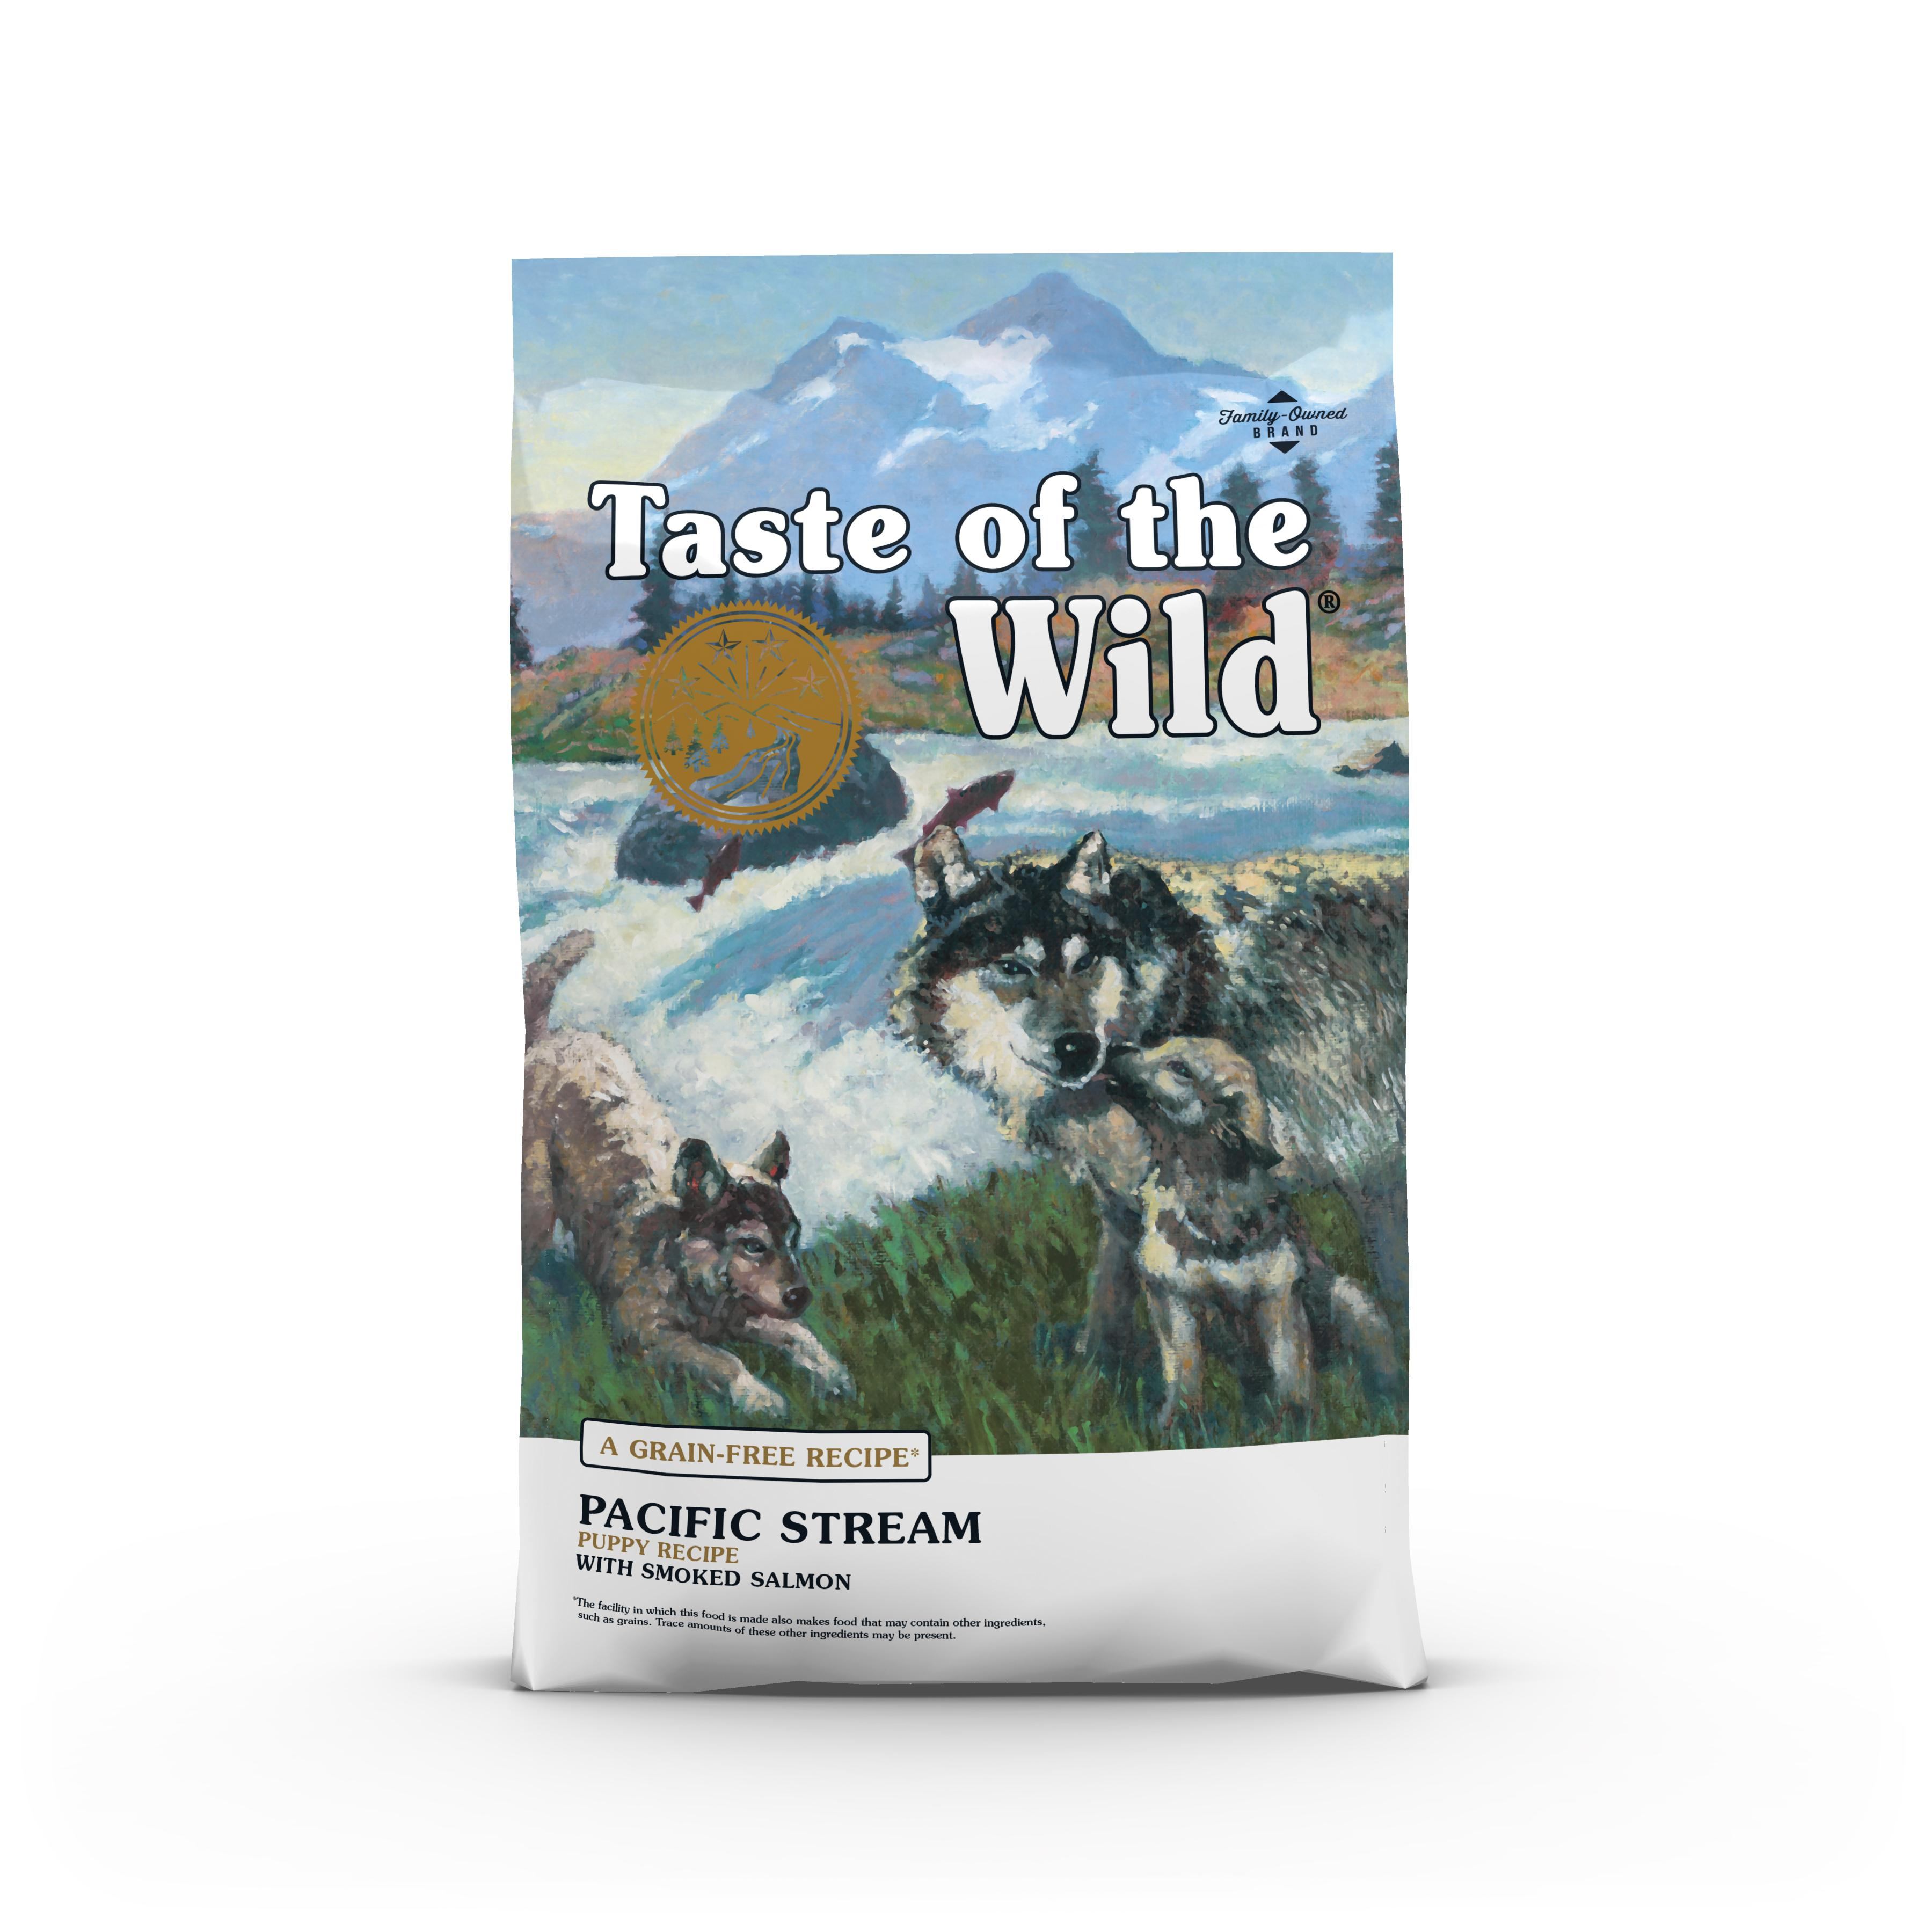 Taste of the Wild Pacific Stream Puppy Formula Grain-Free Dry Dog Food, 5-lb